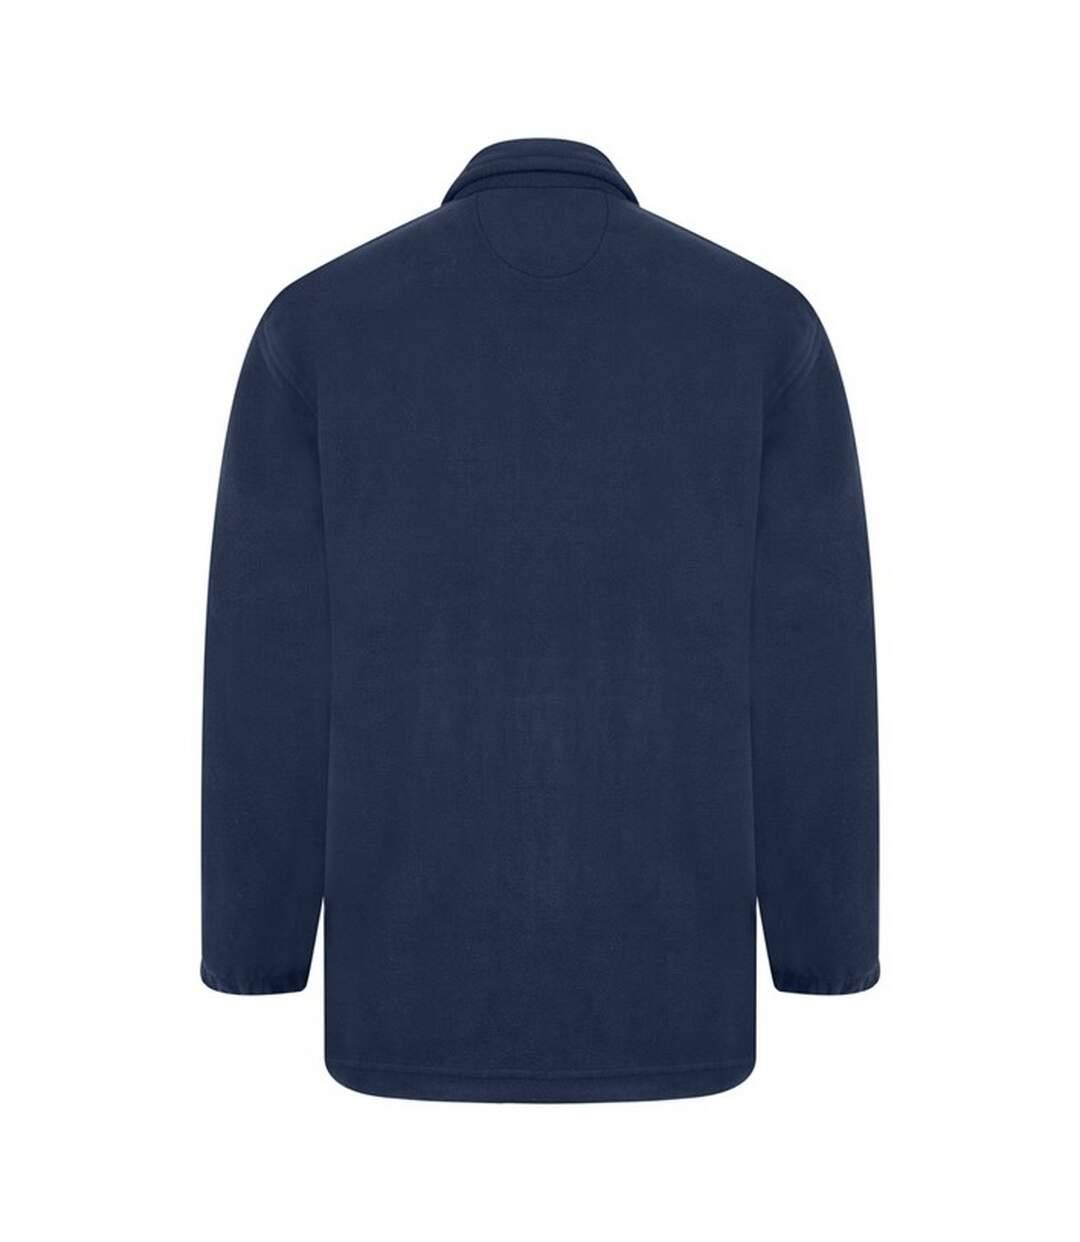 Absolute Apparel - Polaire Zippée Heritage - Homme (Bleu marine) - UTAB128